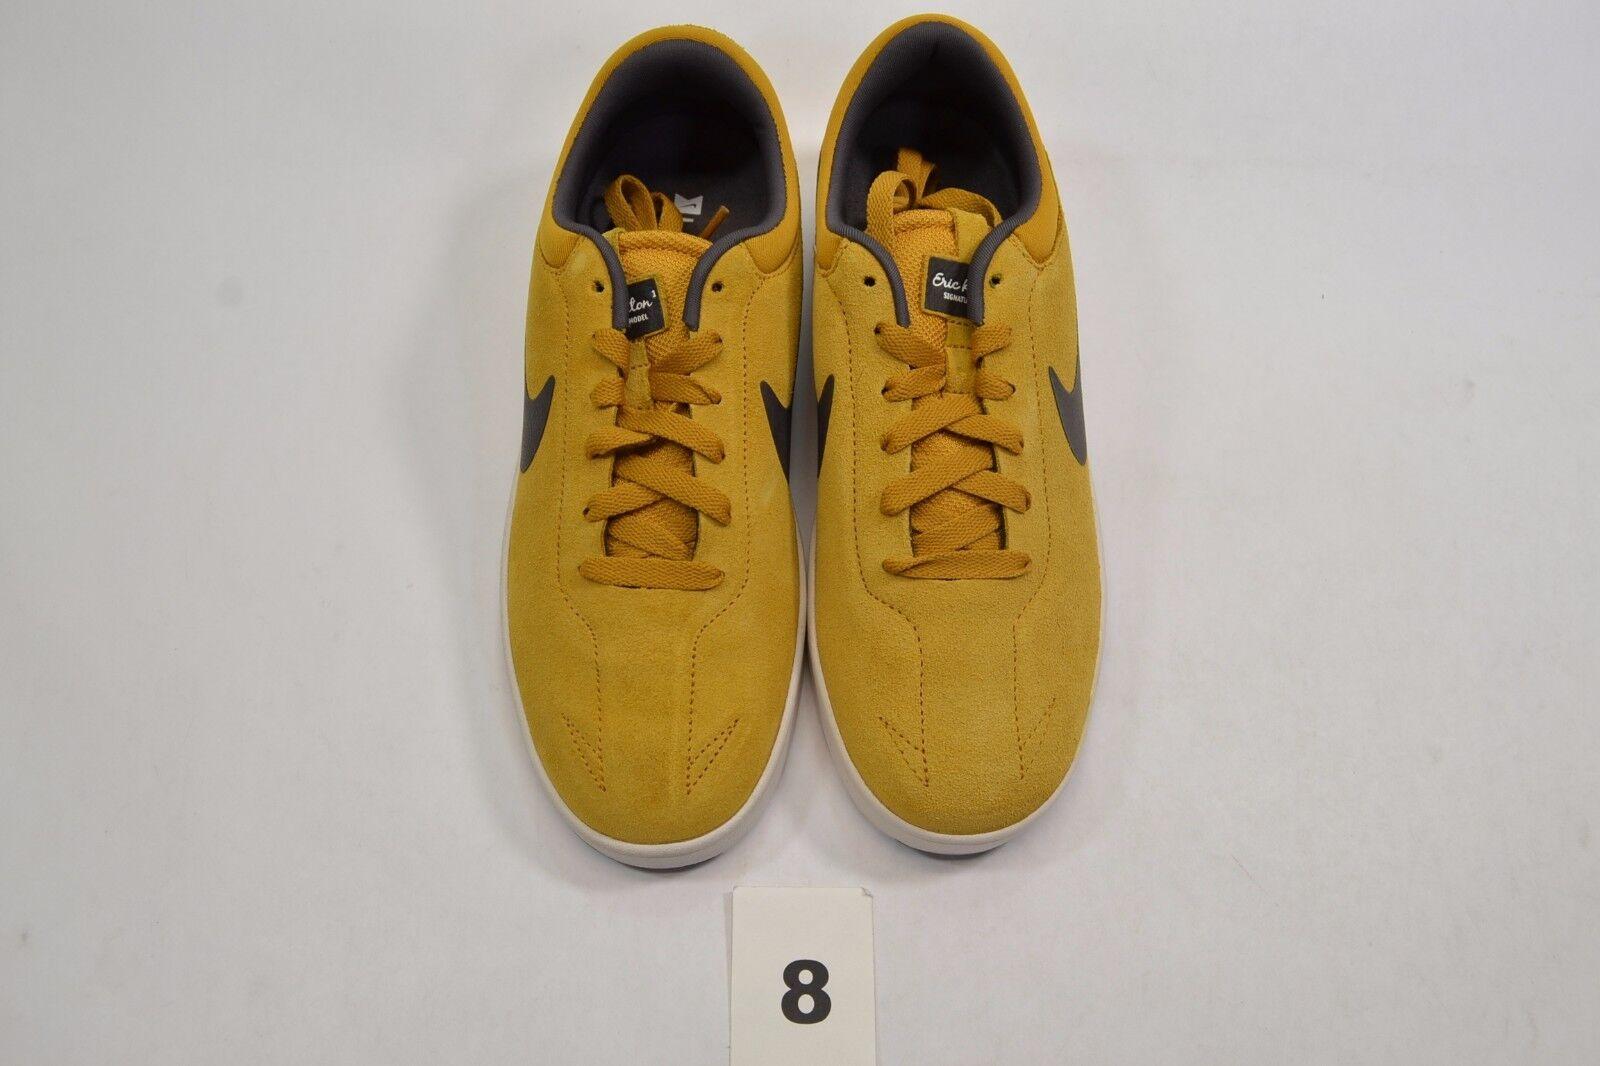 Nike ERIC KOSTON Dark Tar Gold Leaf Brown blanc Tar Dark Discounted (187) homme chaussures 3798c3